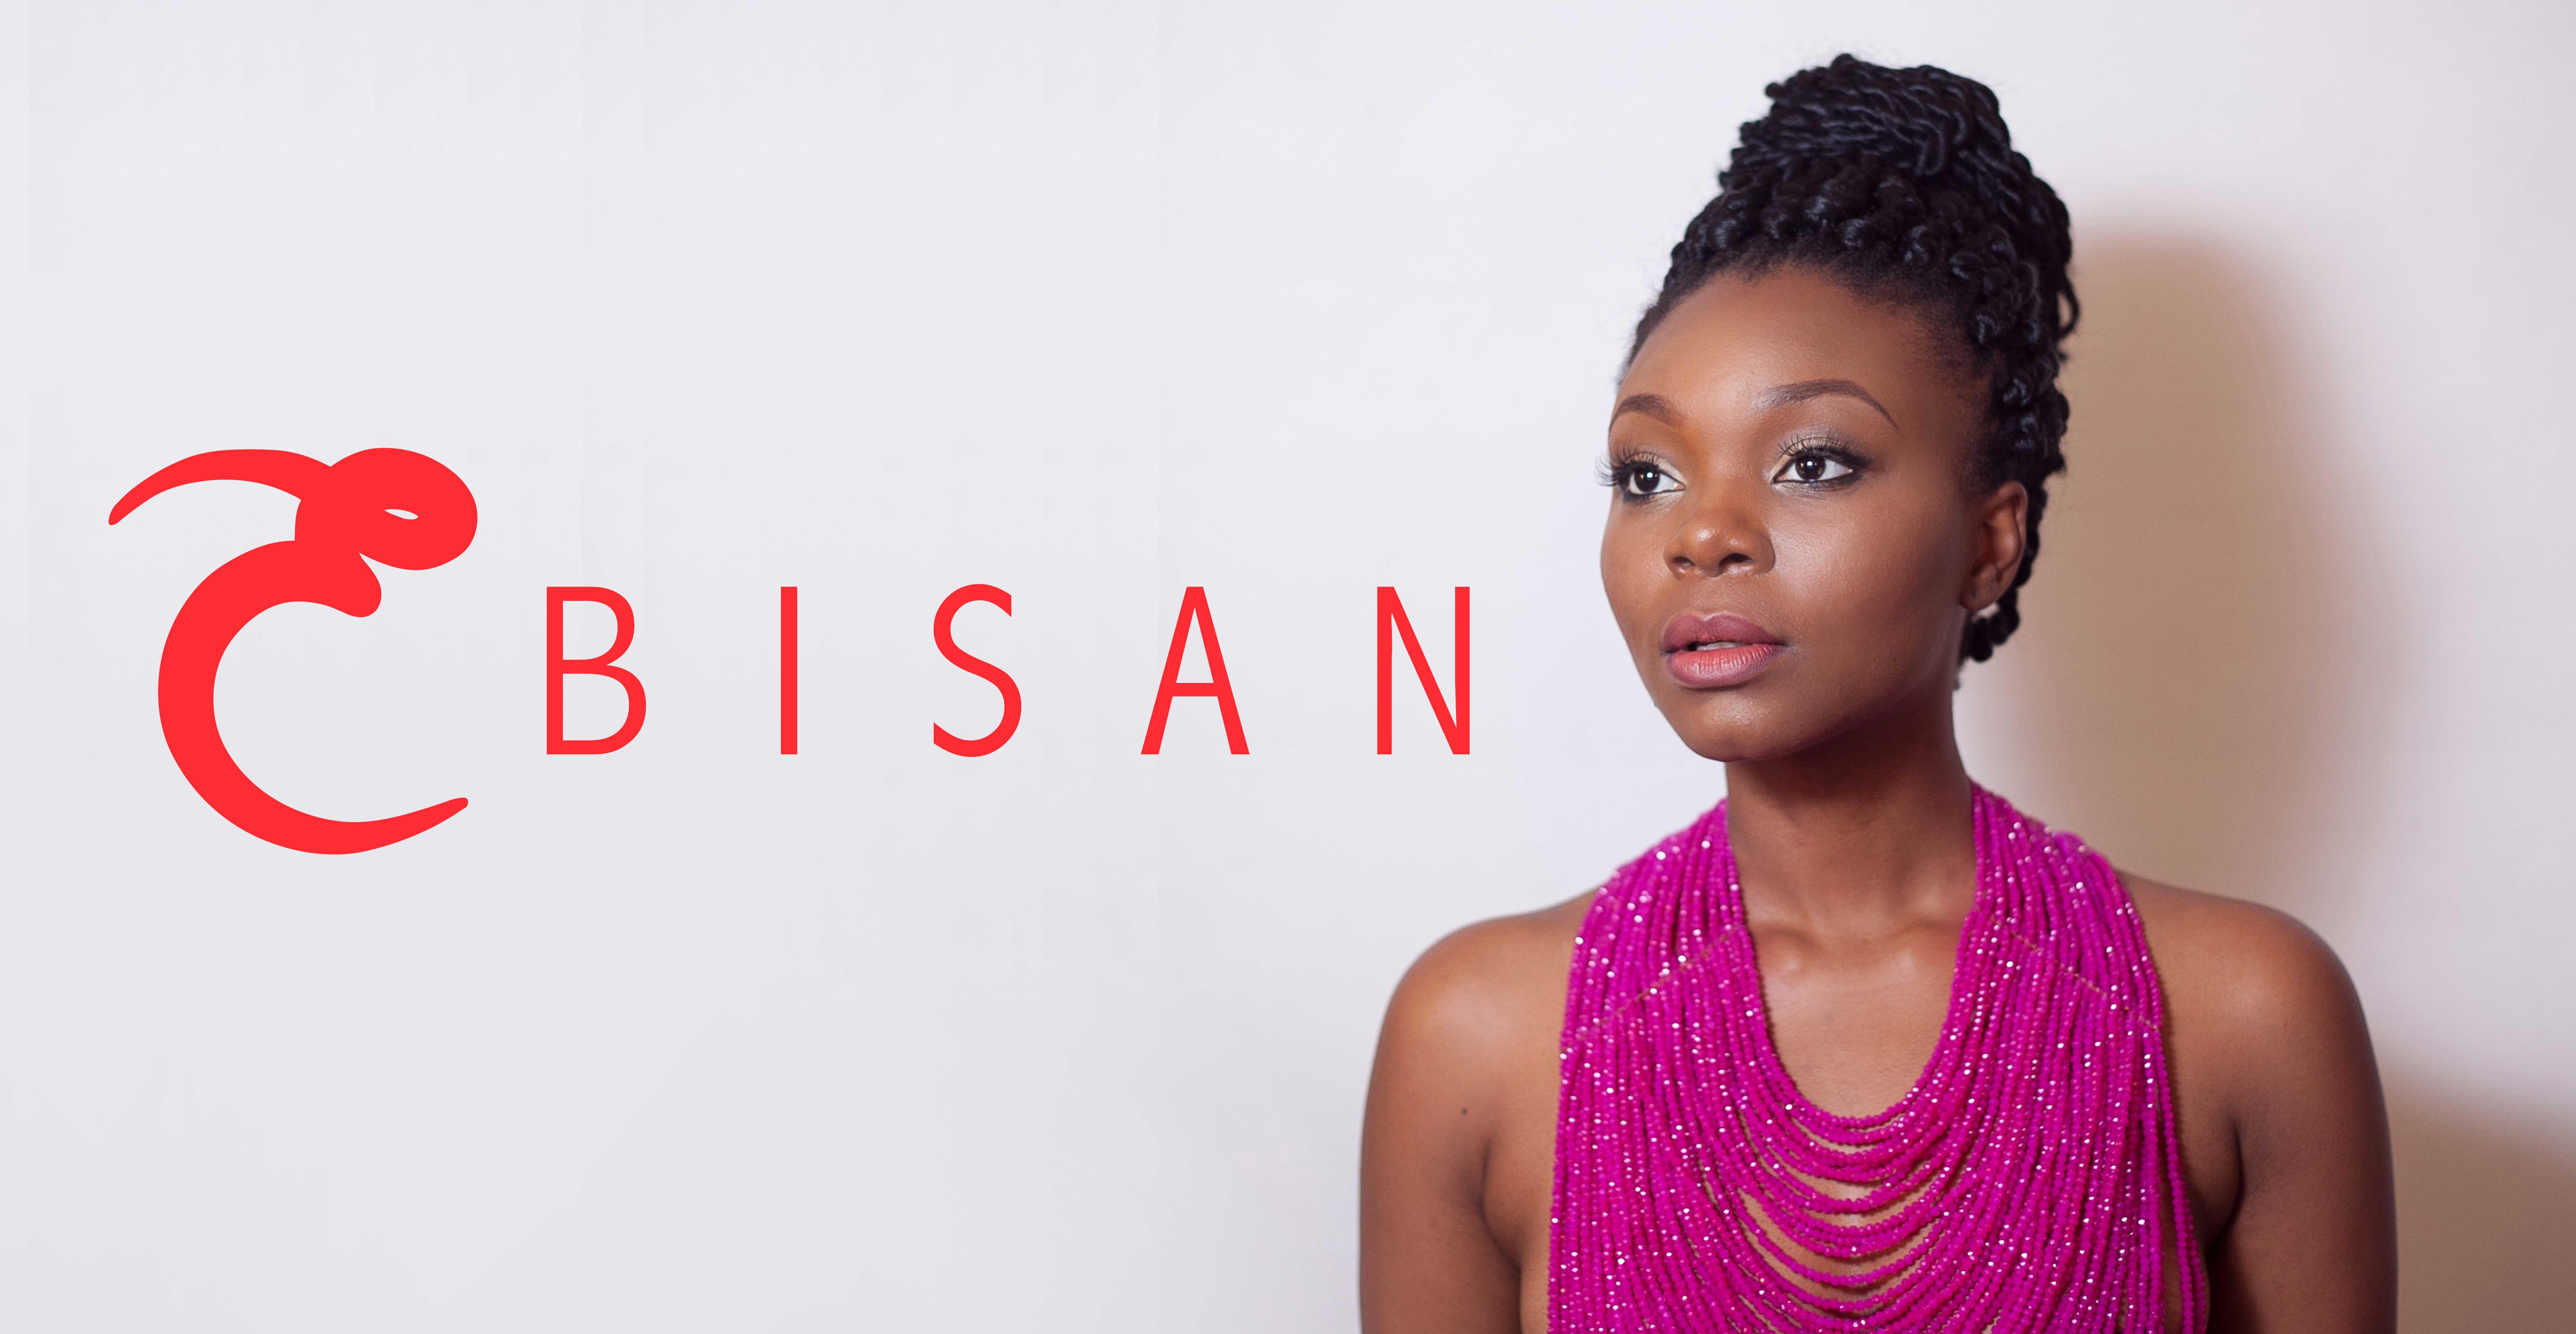 Ebisan-I